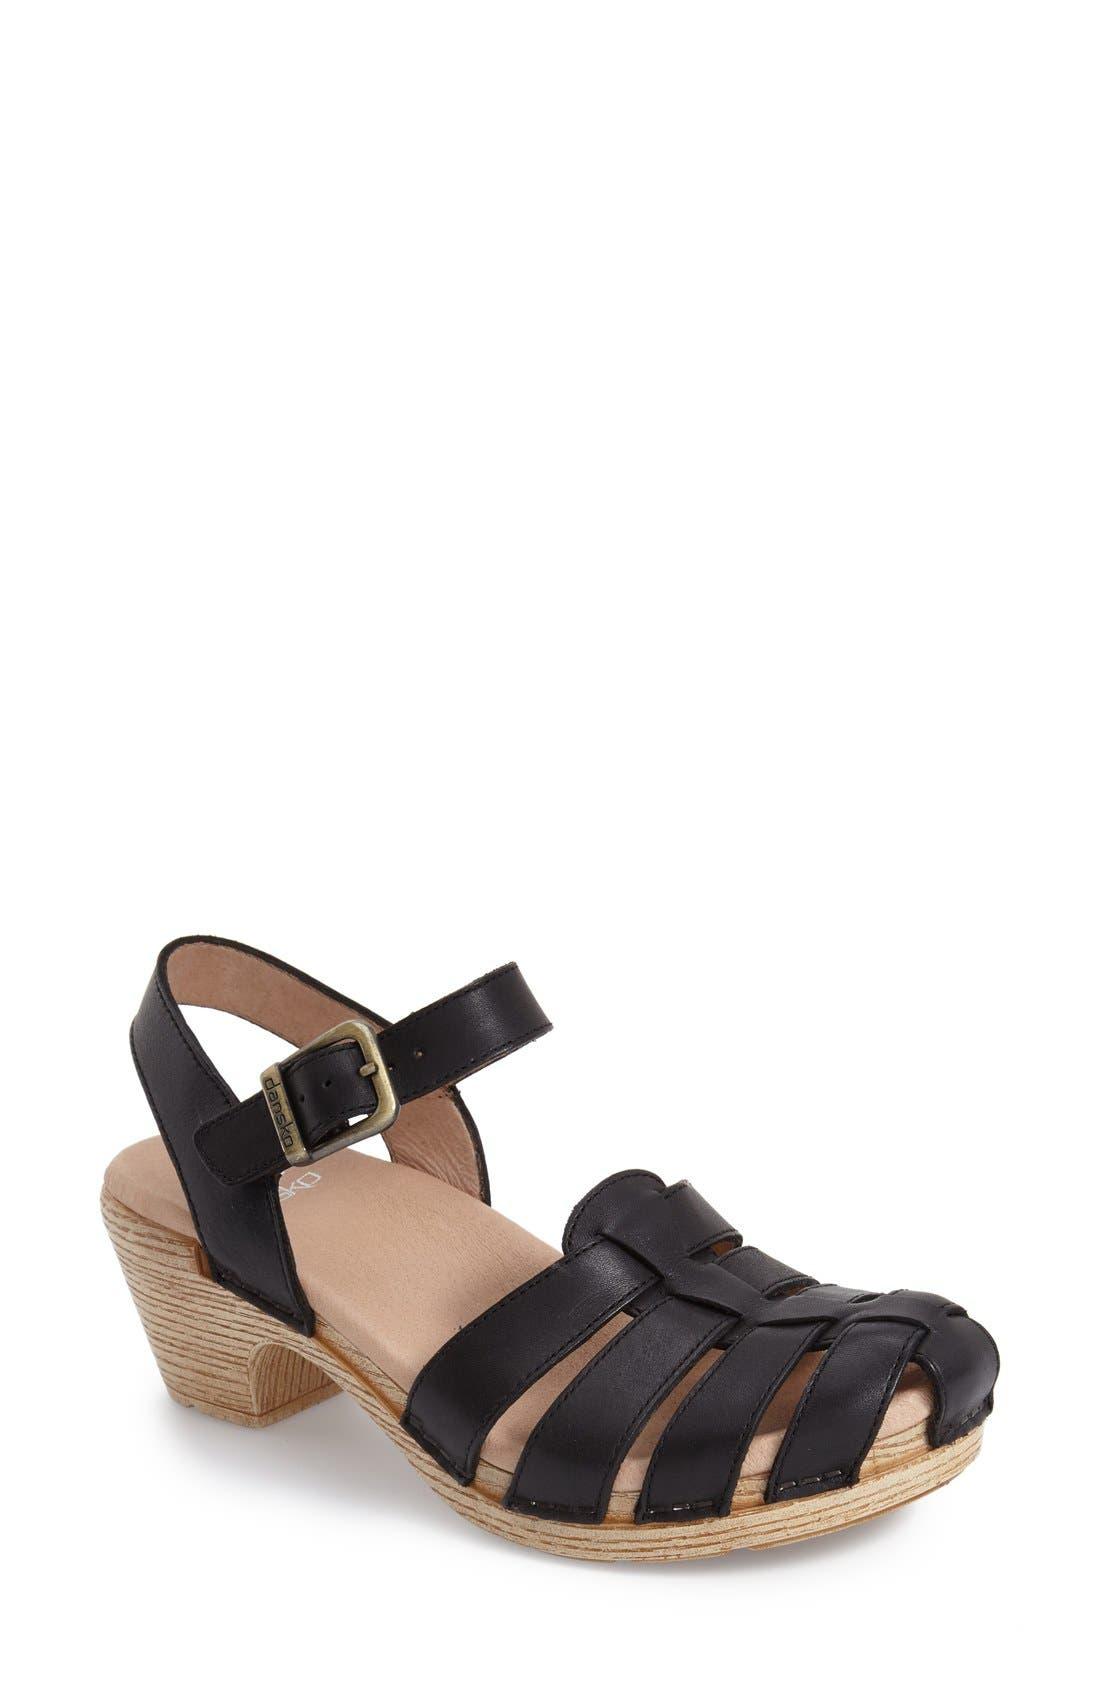 DANSKO 'Milly' Clog Sandal